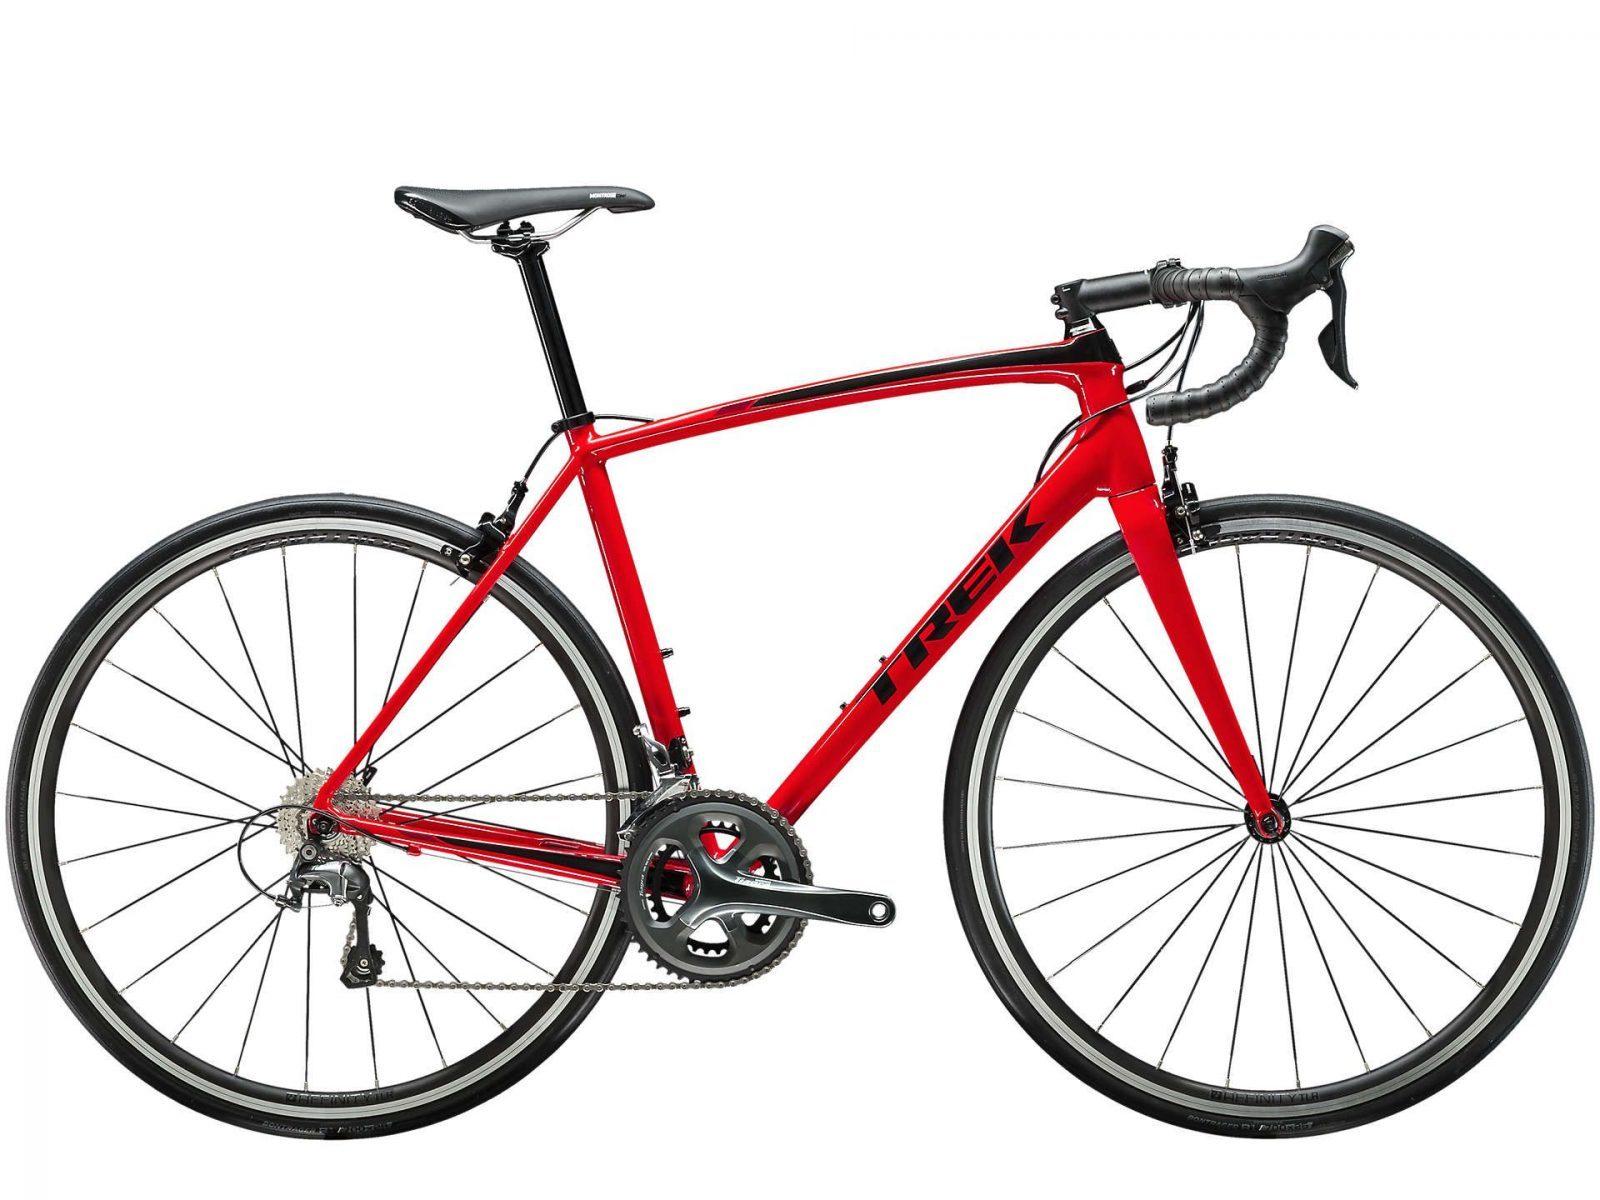 Trek Emonda yol bisikleti